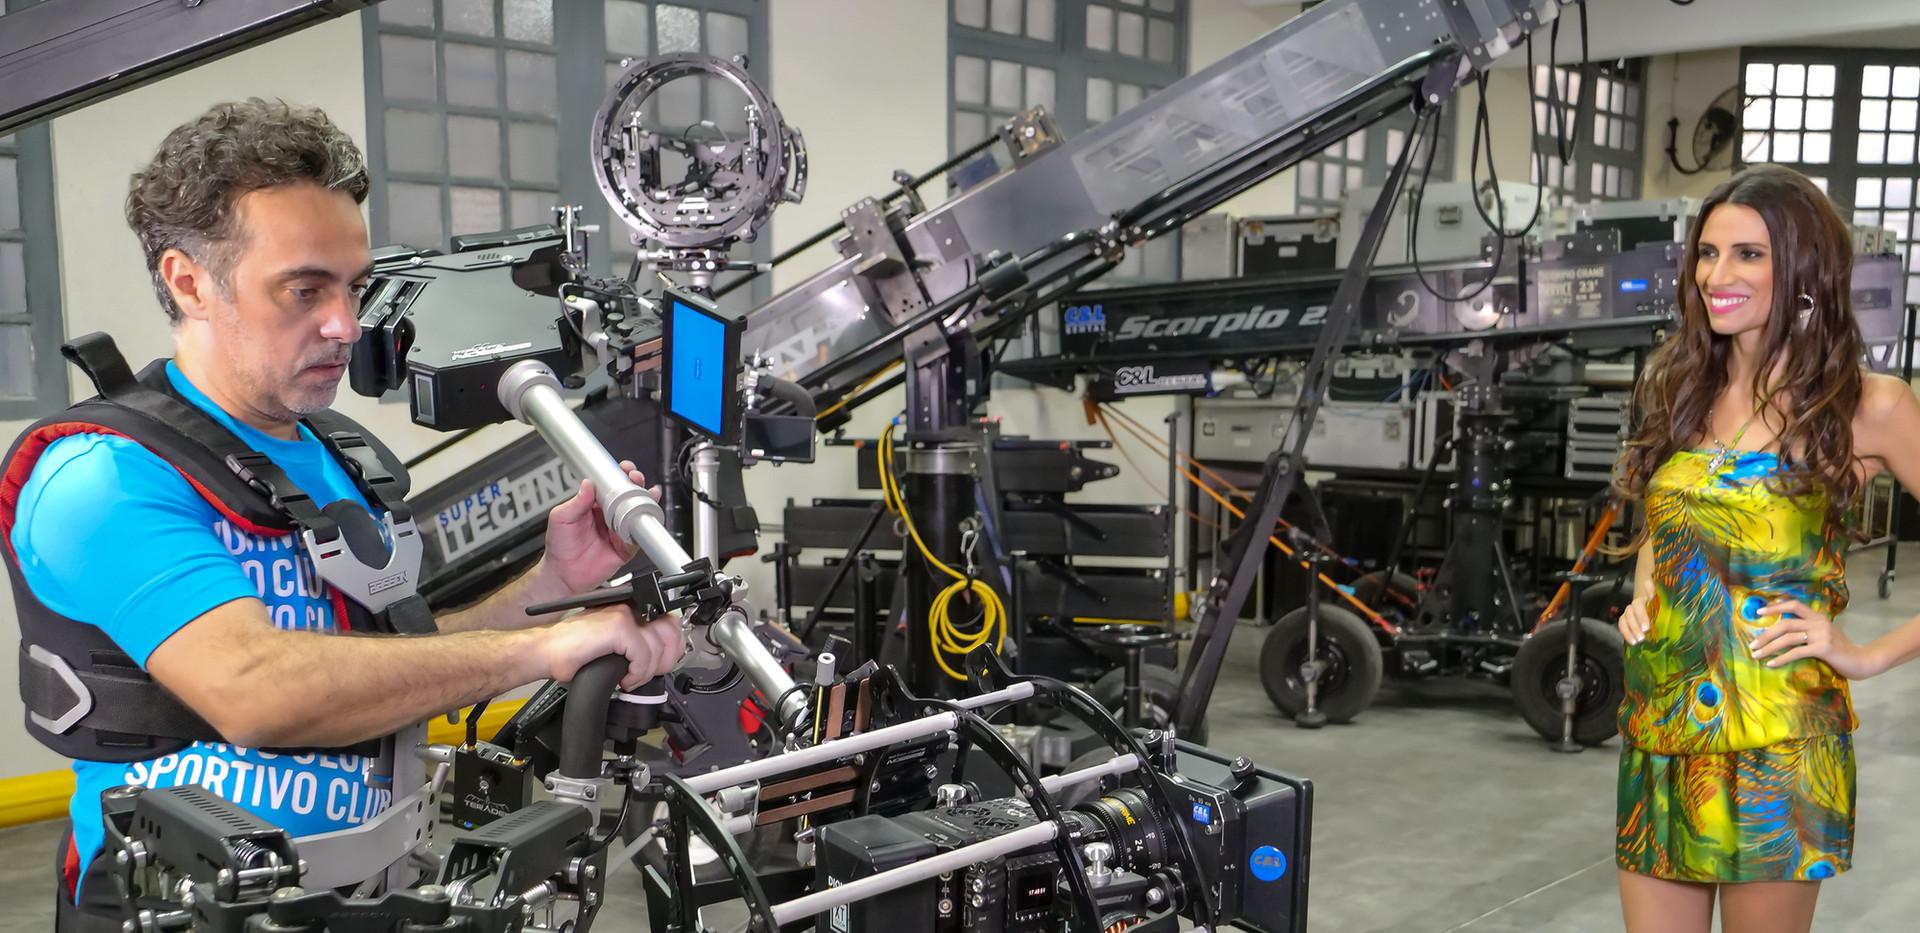 Red digital cinema camera Helium 8k on 8 axis hybrid camera stabilizer steadycam from Basson Steady model Endless 3